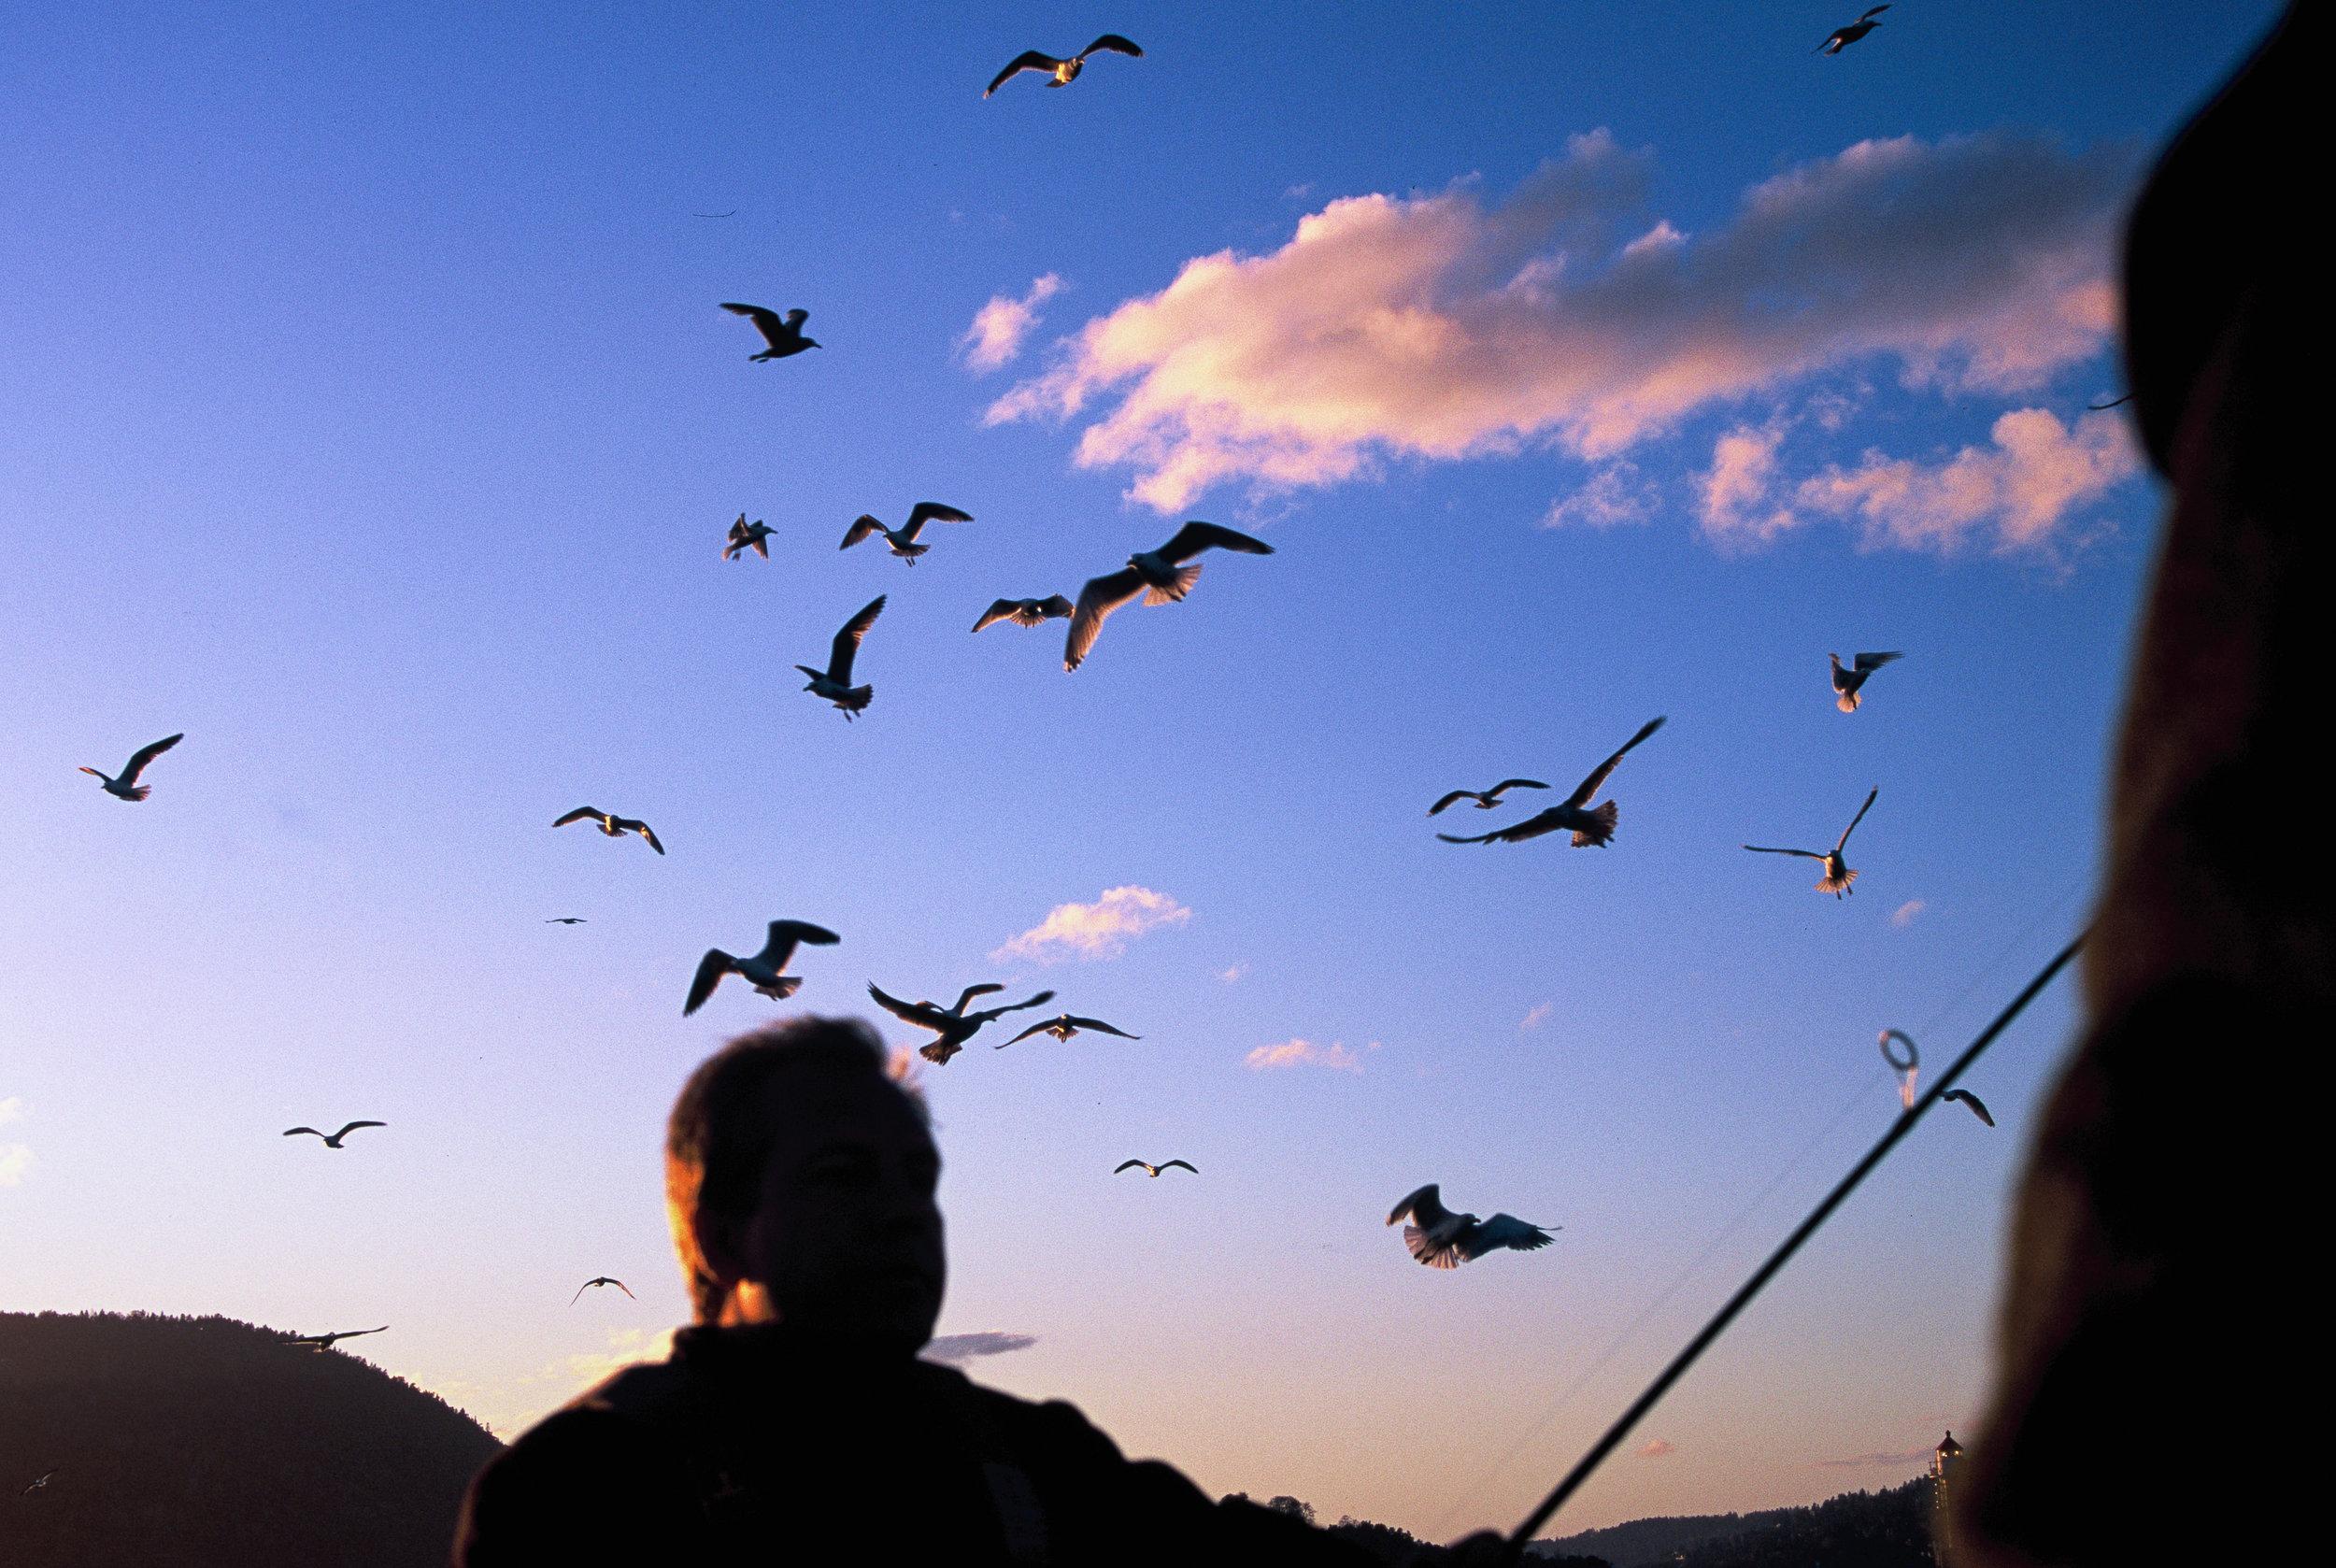 Seagulls always appear when fishing in Norway. Photo by Daniel Novelllo